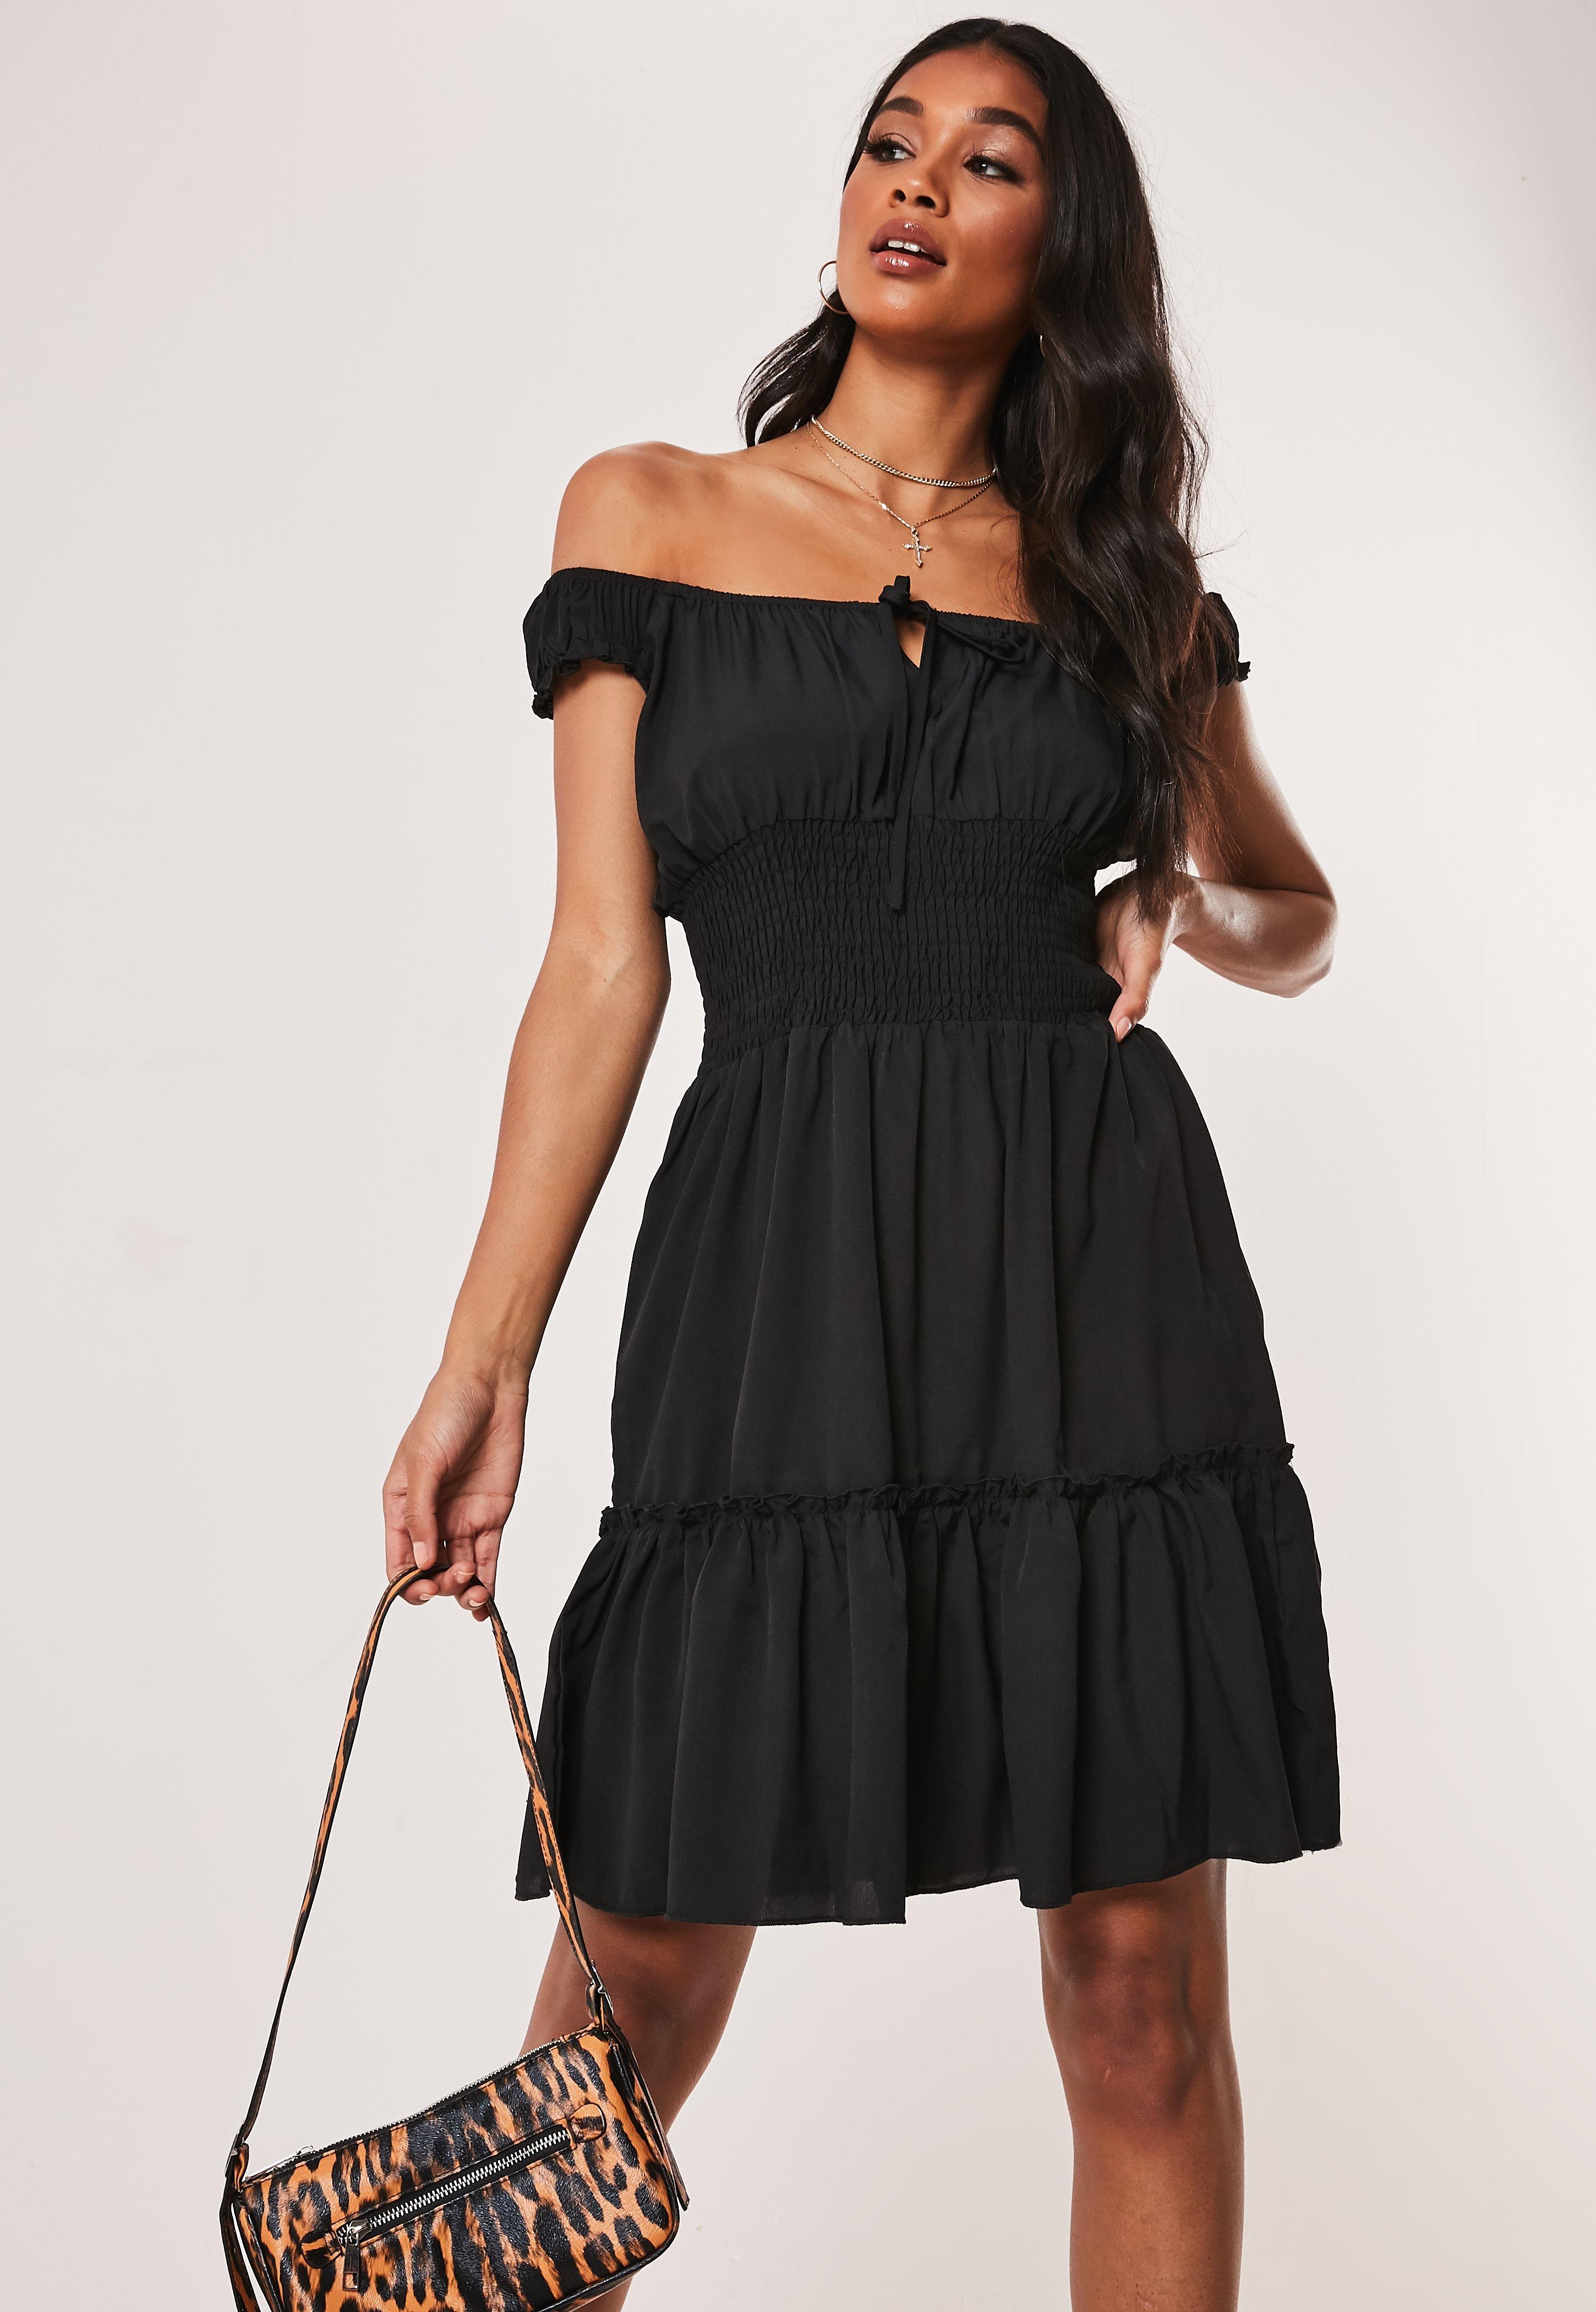 6ffc348e7be Off the Shoulder Dresses - Bardot Dresses Online   Missguided